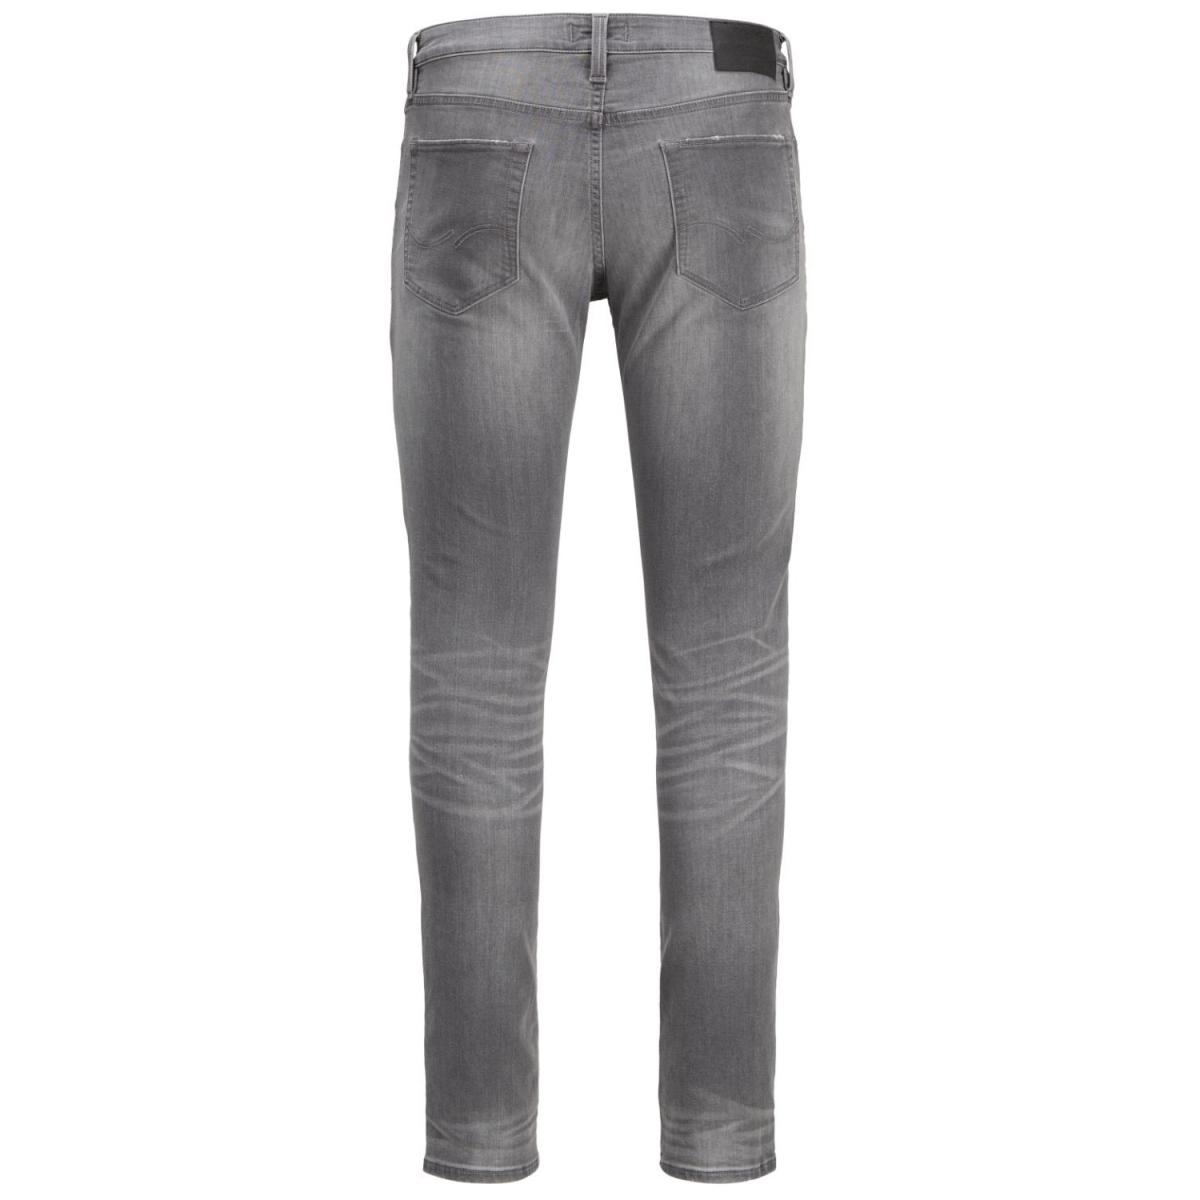 jjiglenn jjicon cr 063 indigo knit 12136316 jack & jones jeans grey denim